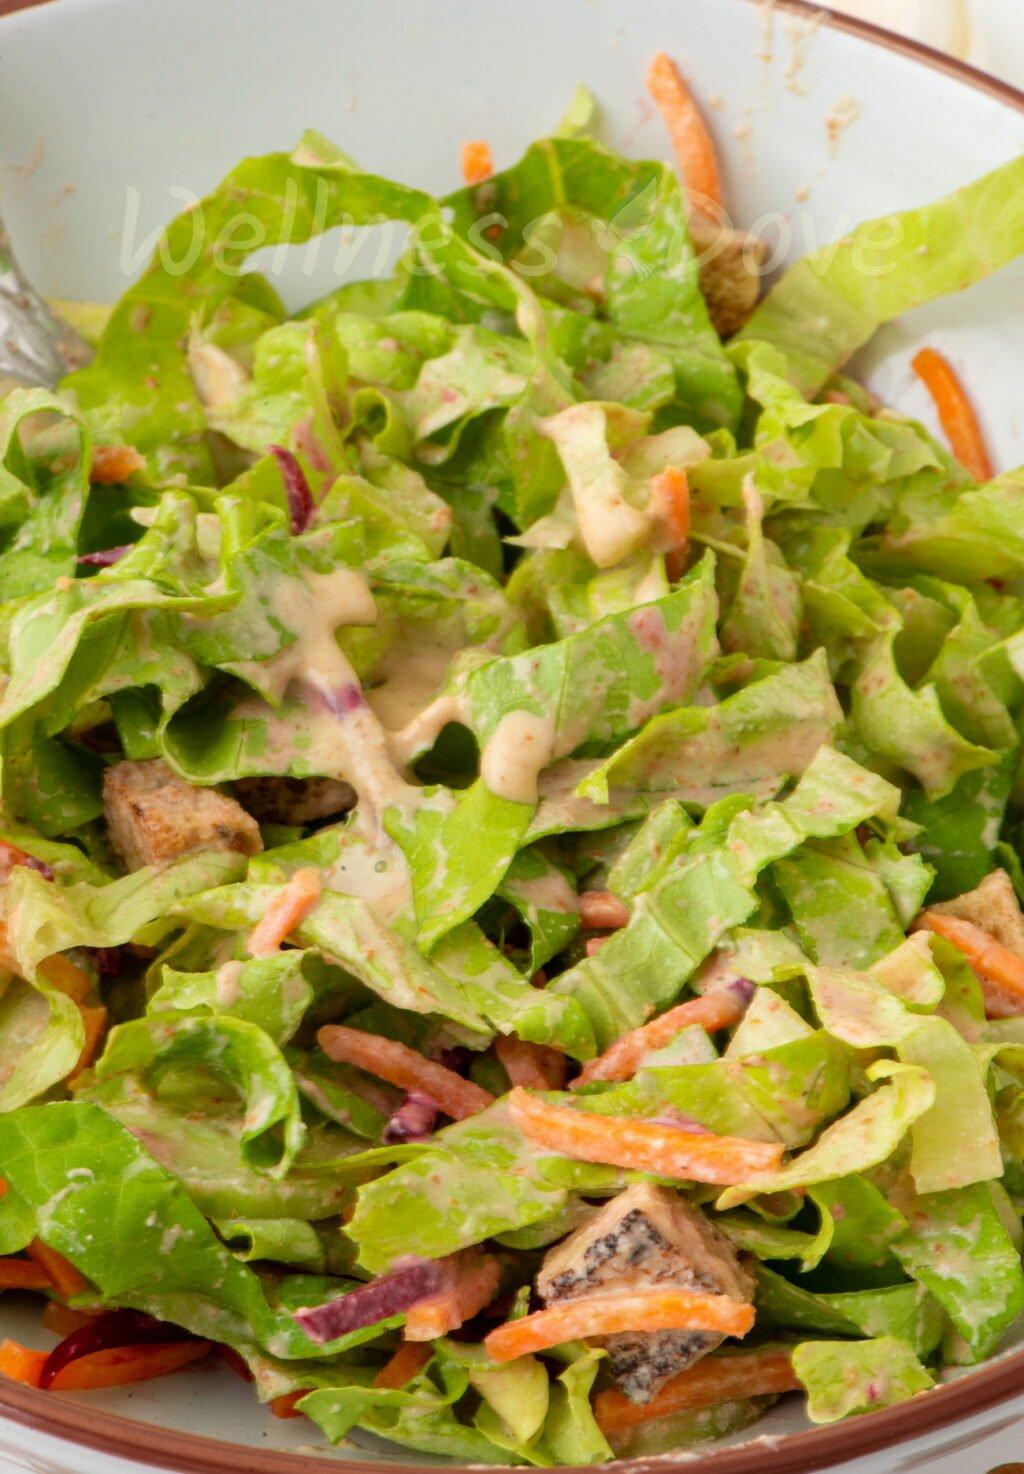 vegan no oil salad dresssing